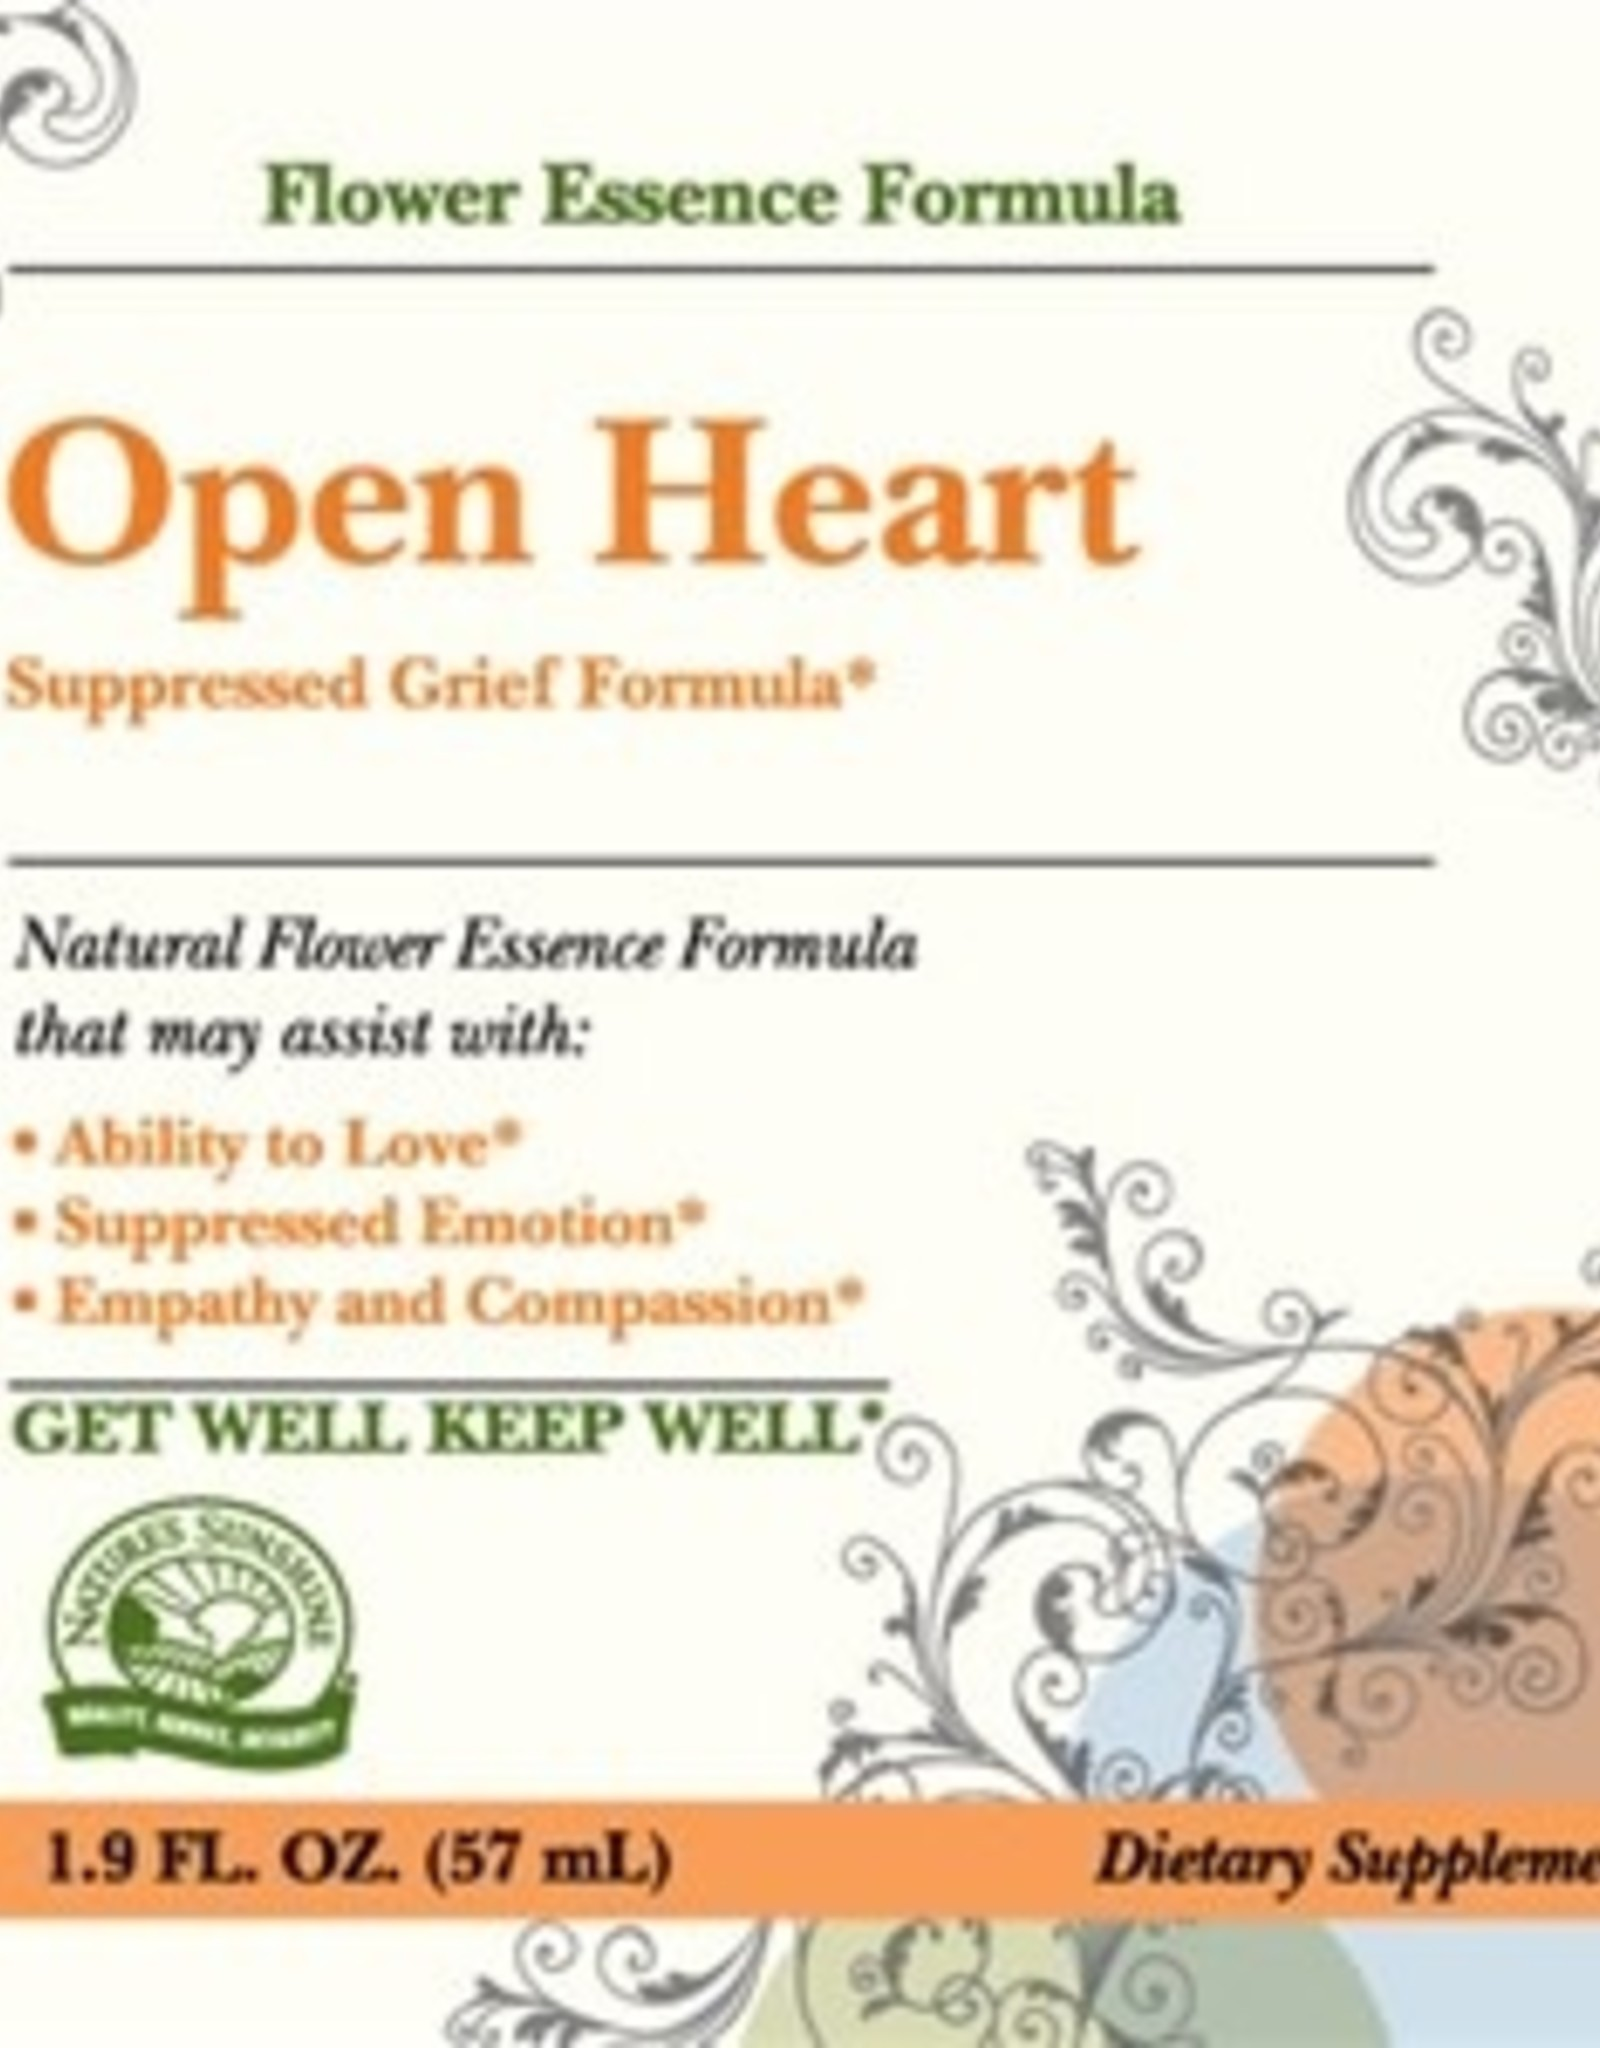 Nature's Sunshine Open Heart (Suppressed Grief Formula) (2 fl. oz.)